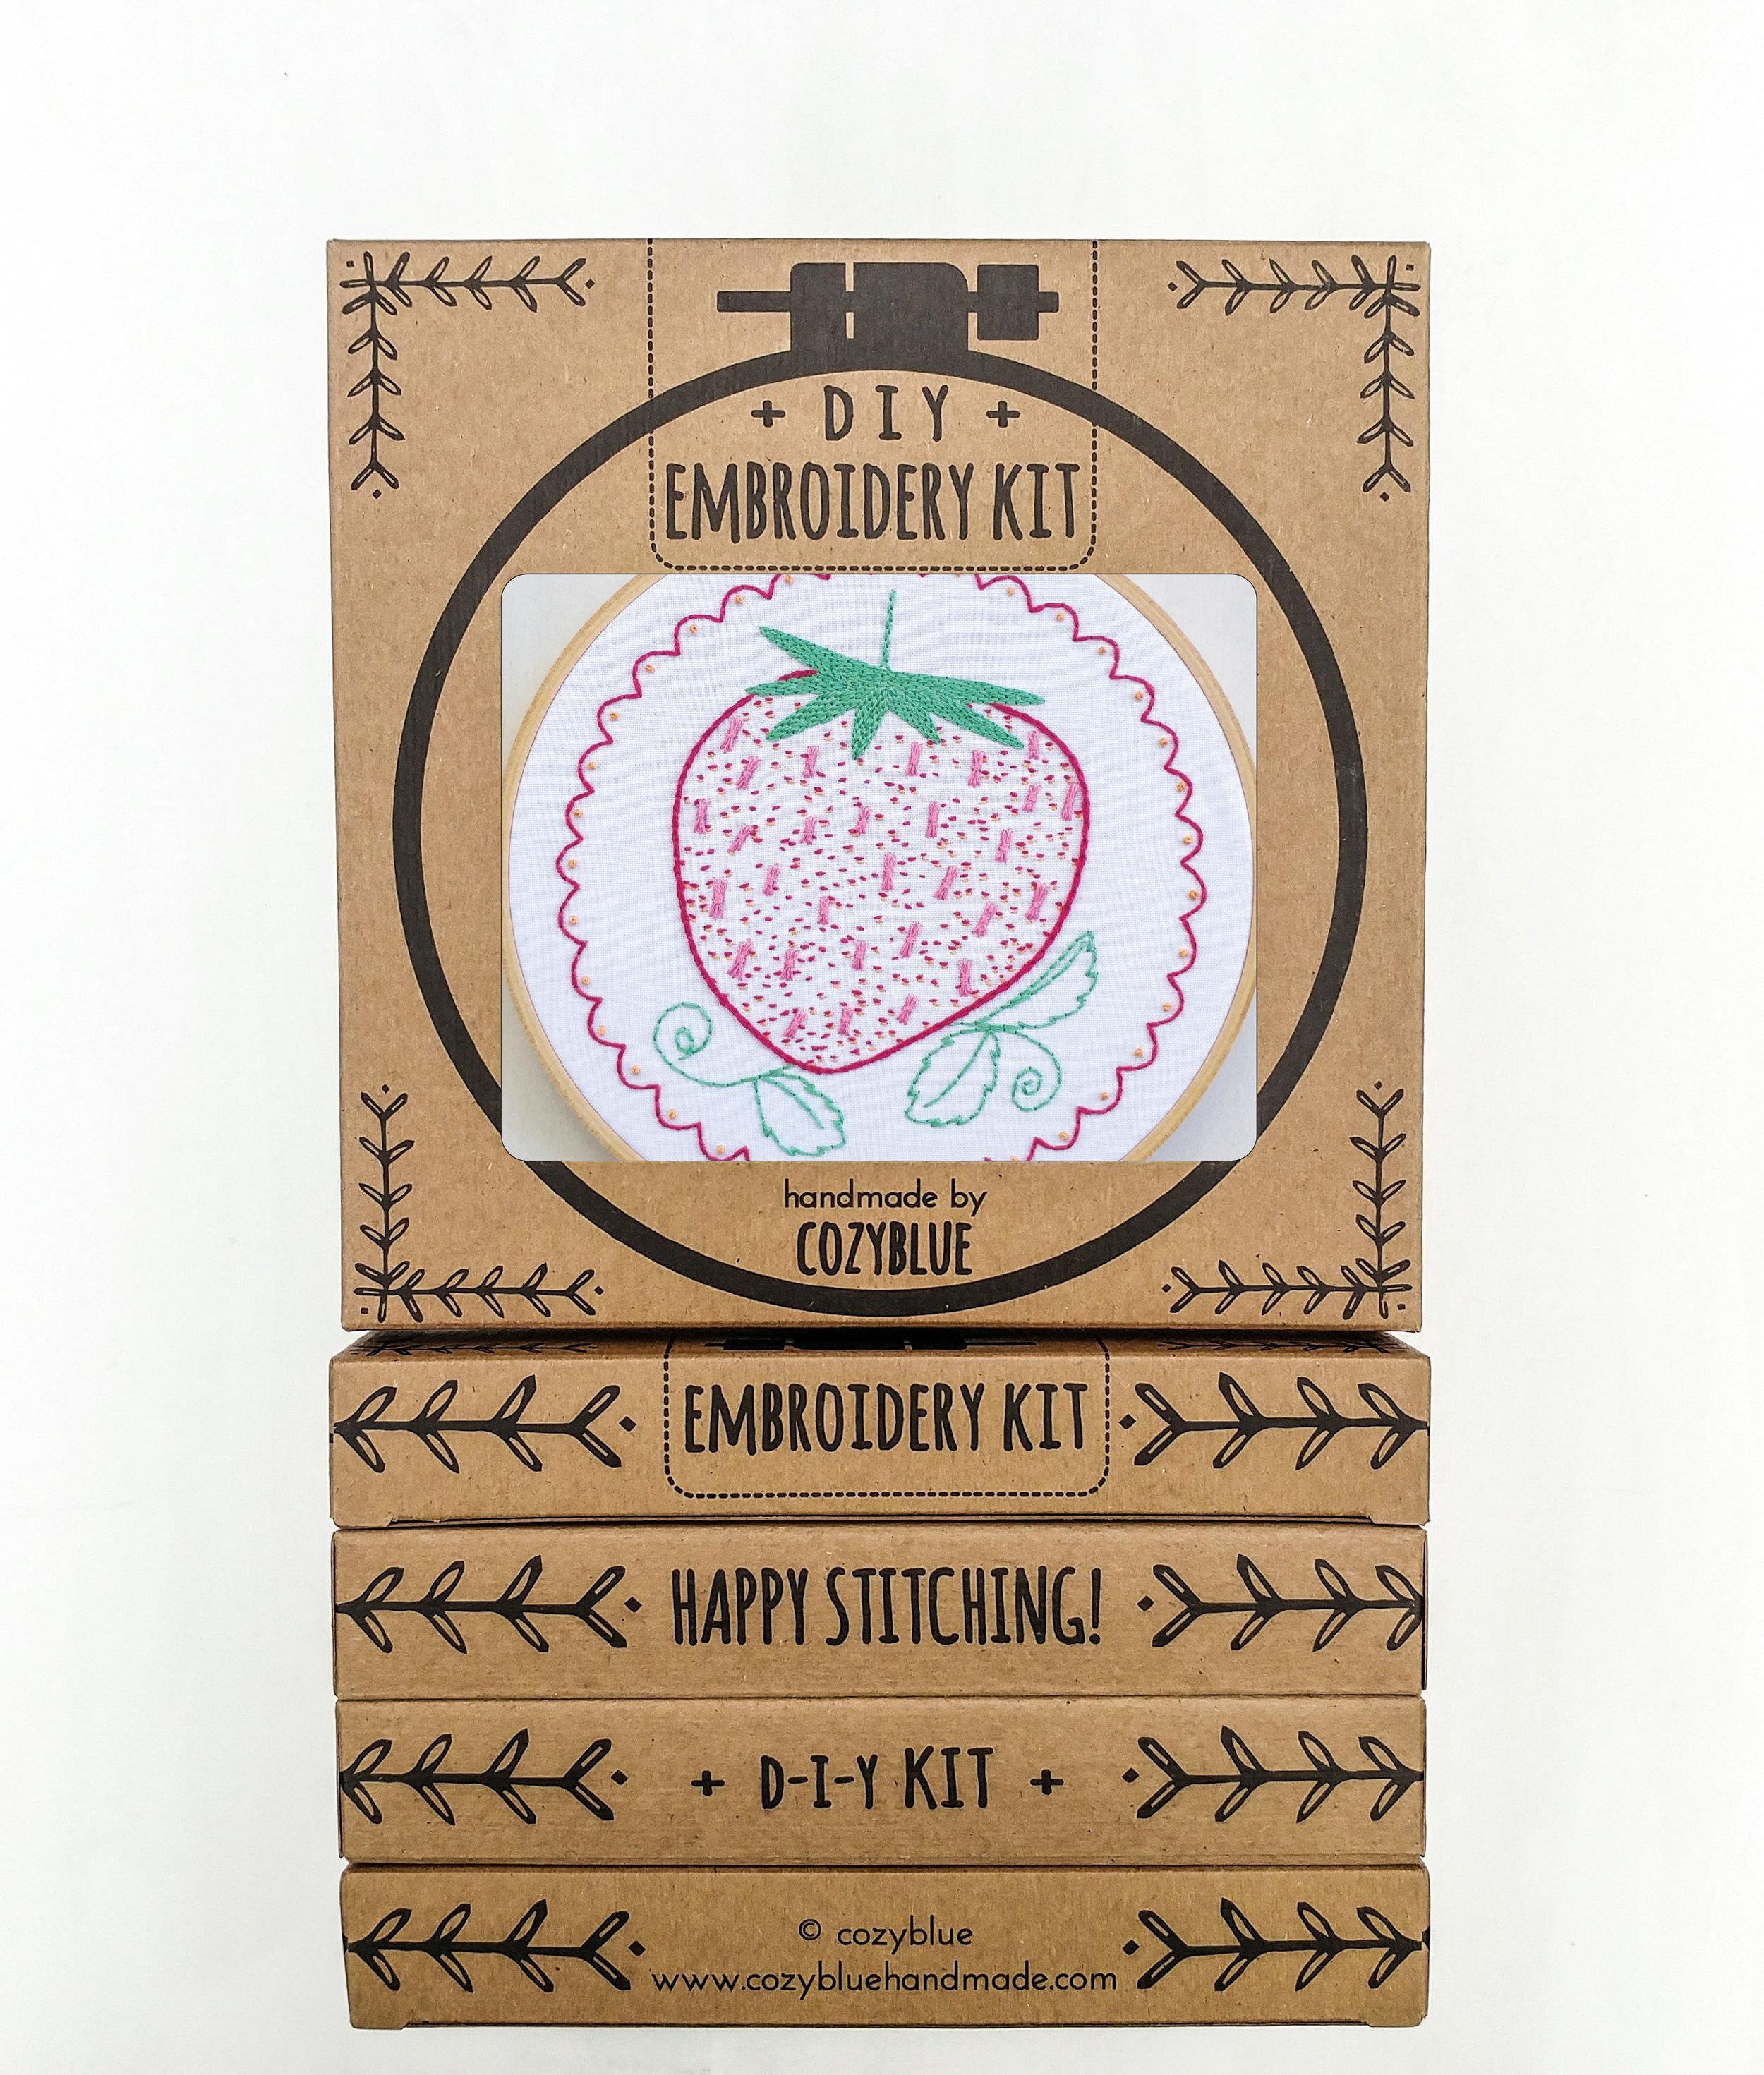 strawberry kit photo.jpg